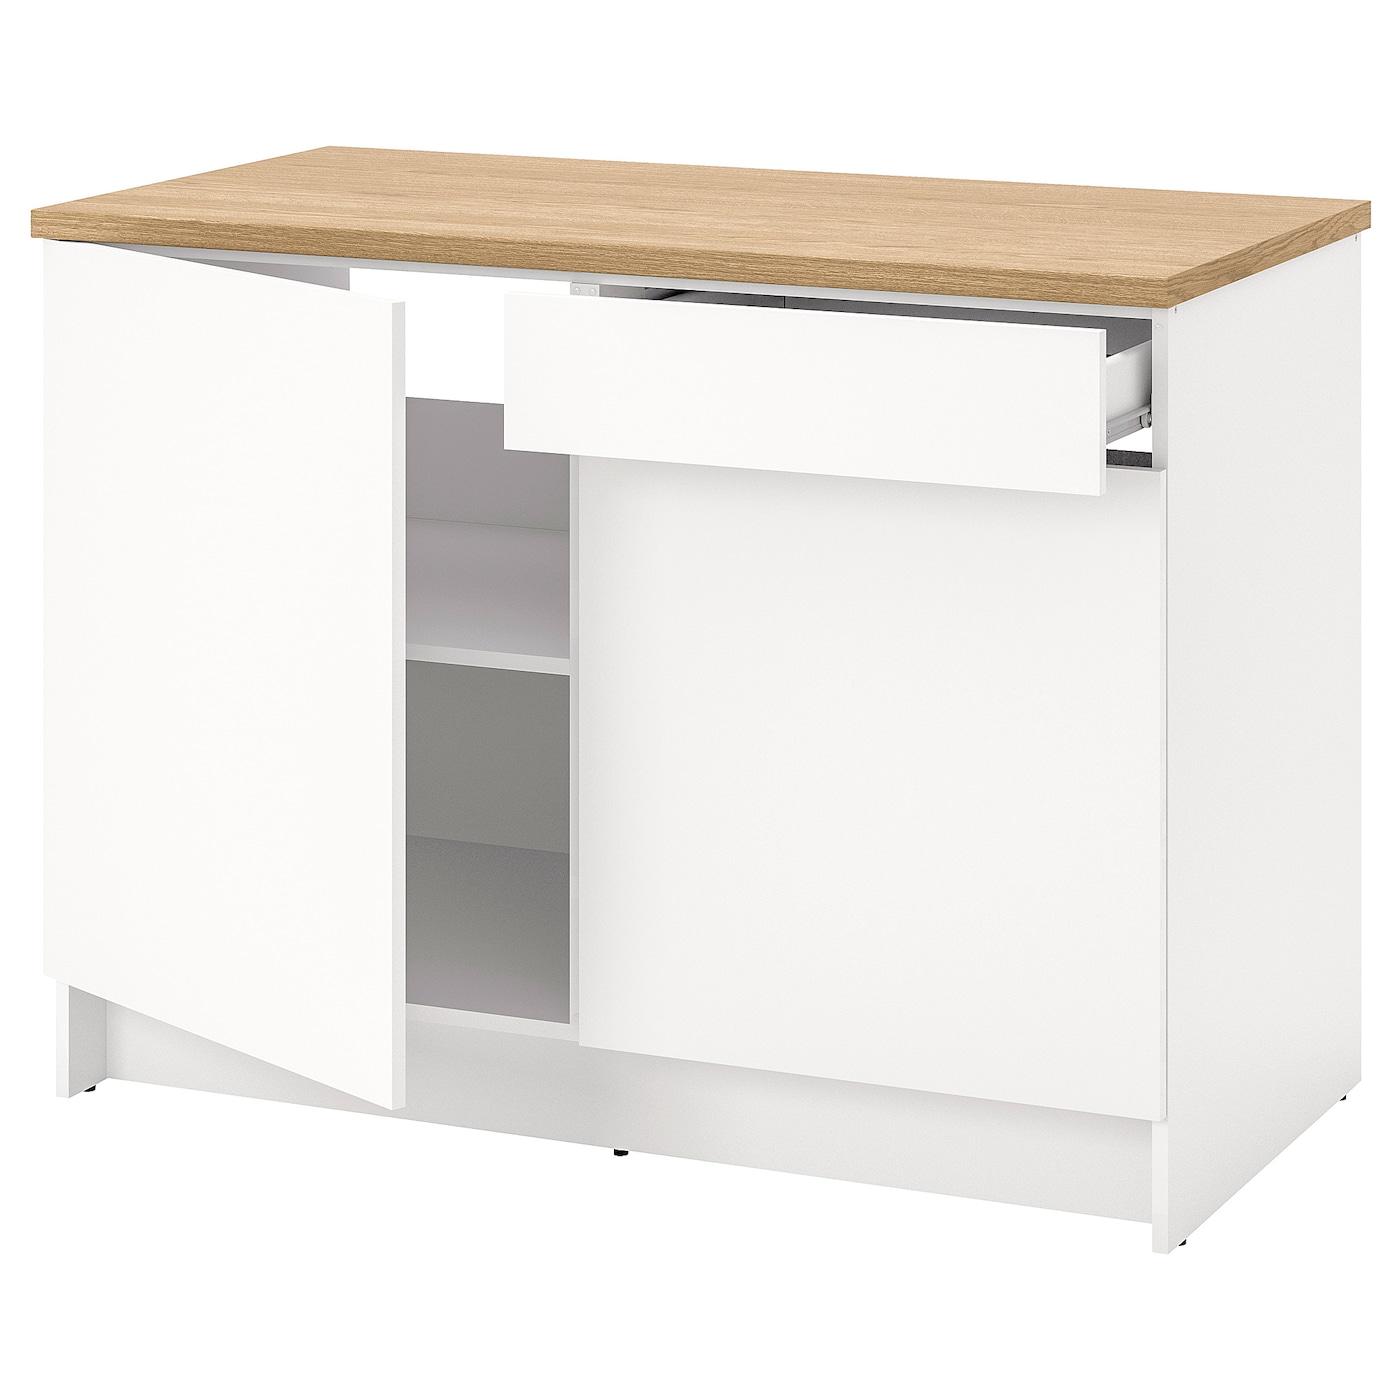 https://www.ikea.com/ie/en/p/komplement-box-light-grey-14